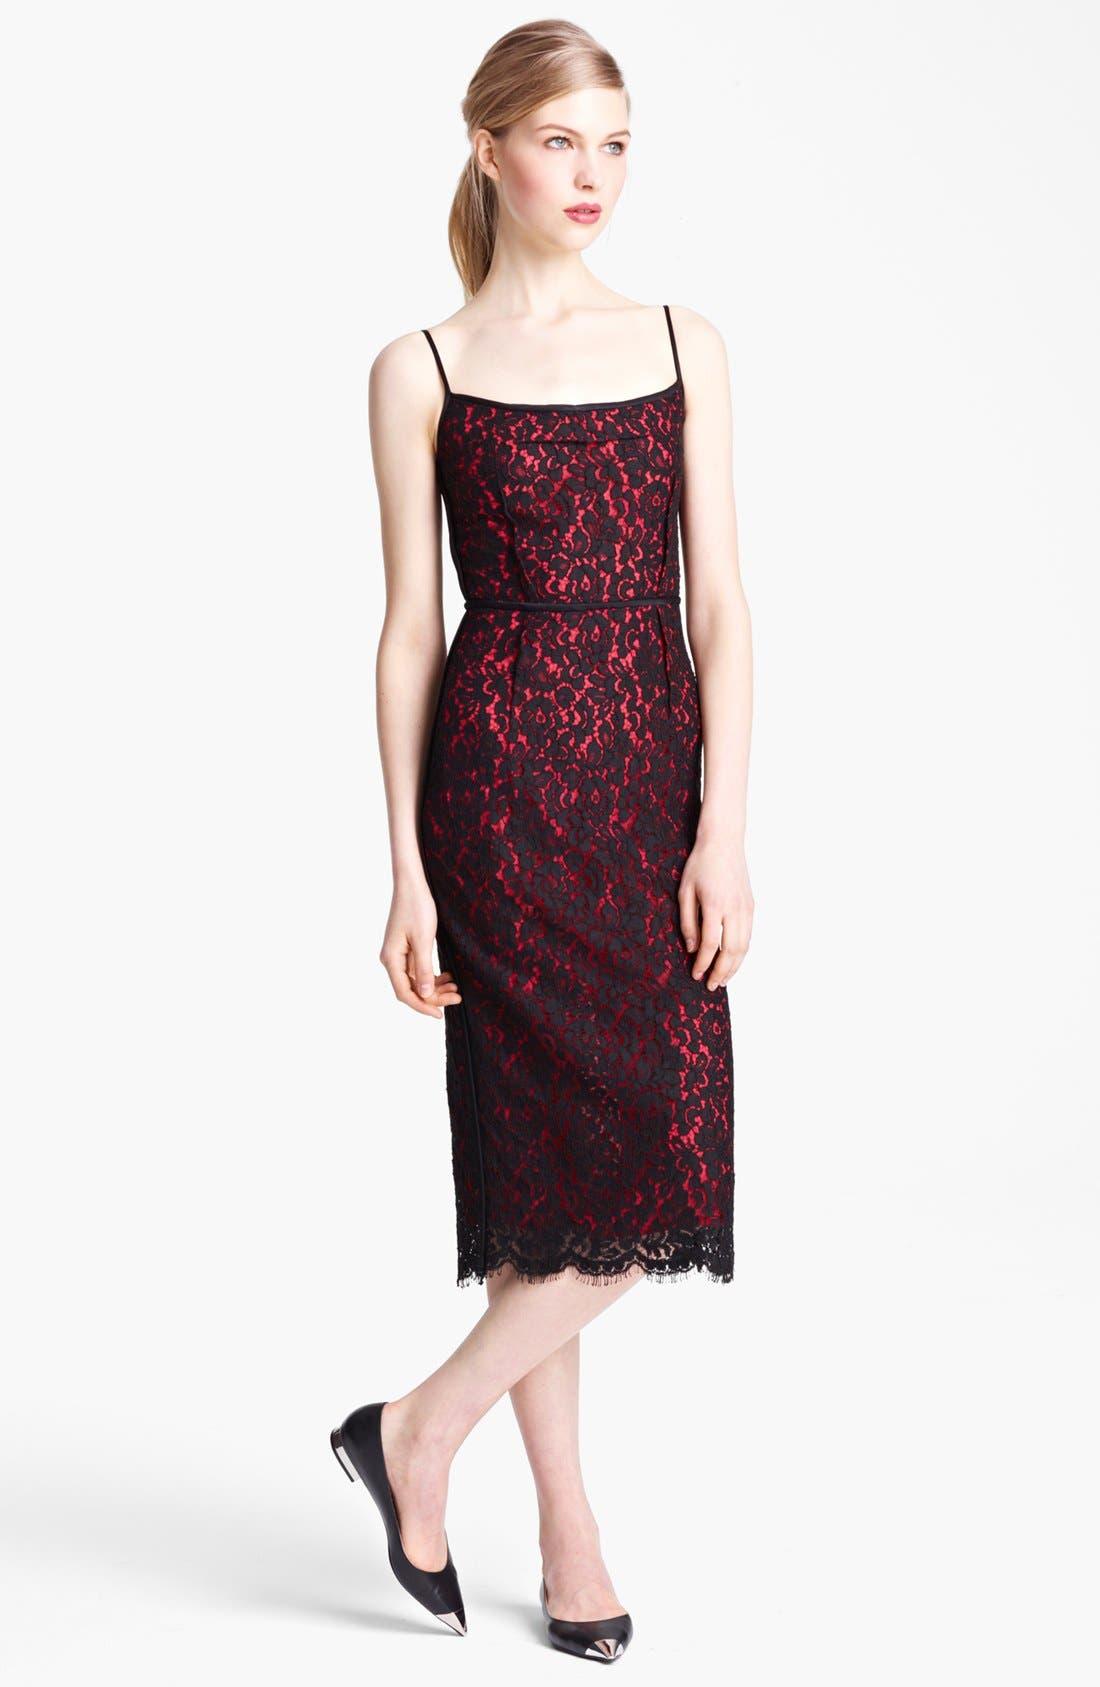 Alternate Image 1 Selected - Michael Kors Floral Lace Sheath Dress